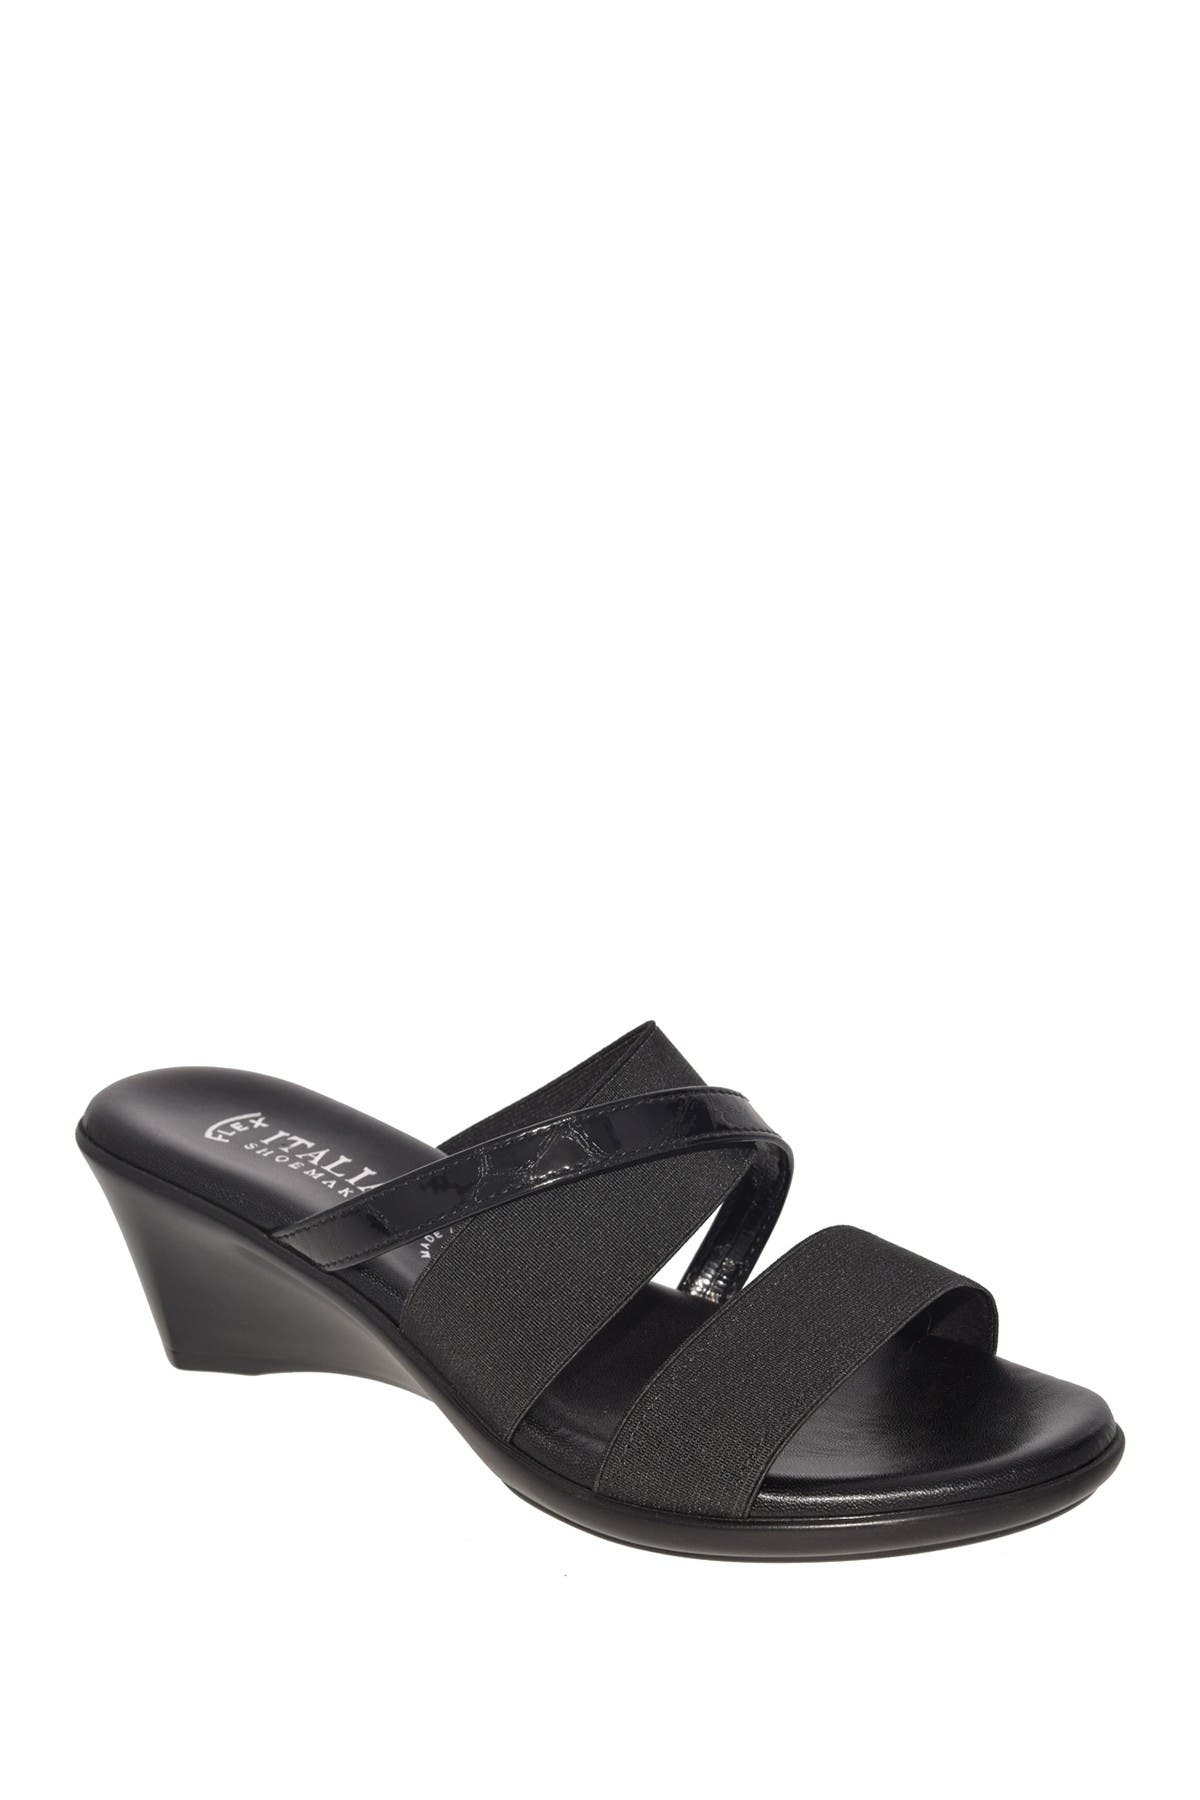 Image of Italian Shoemakers Lorel Strappy Wedge Sandal